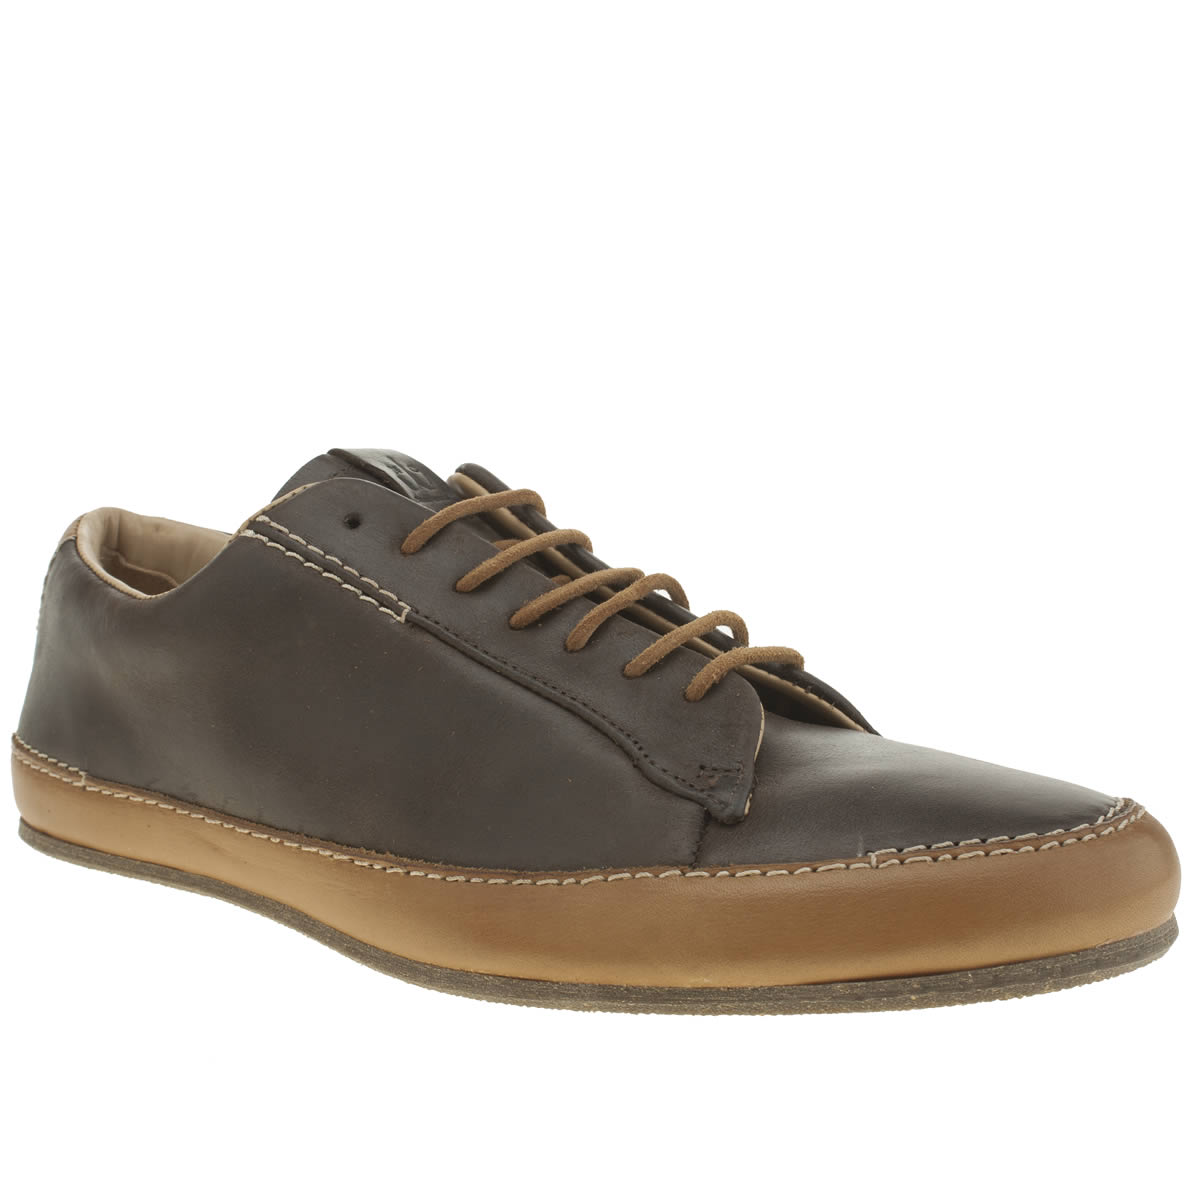 Northern Cobbler Northern Cobbler Brown Brill Shoes